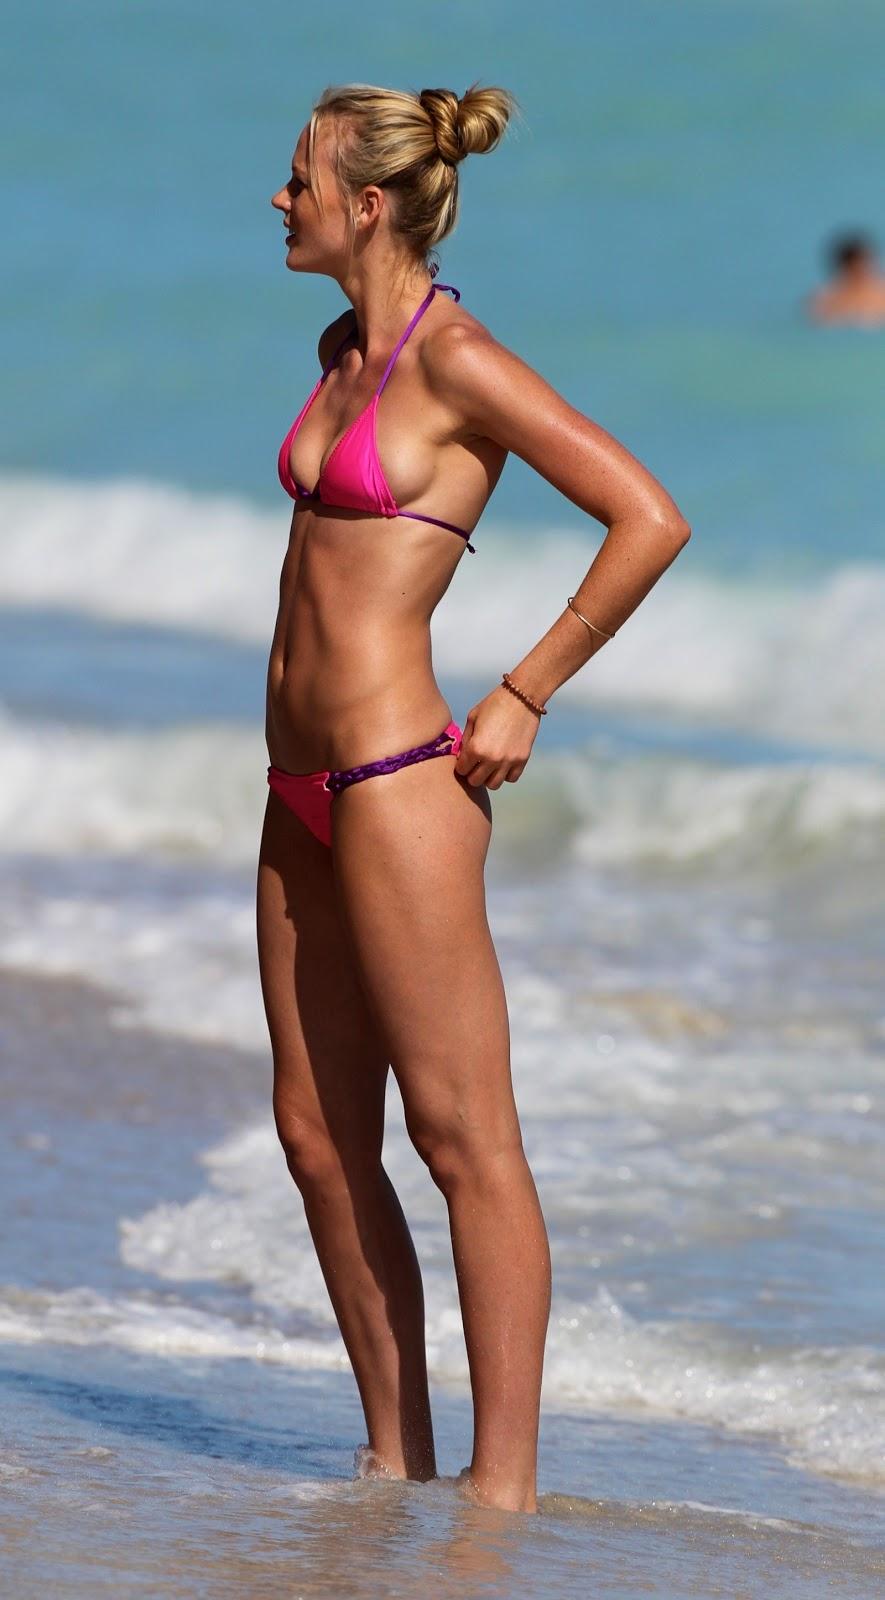 Filthy Anarchists Phlog: Miley Cyrus poolside bikini creeps